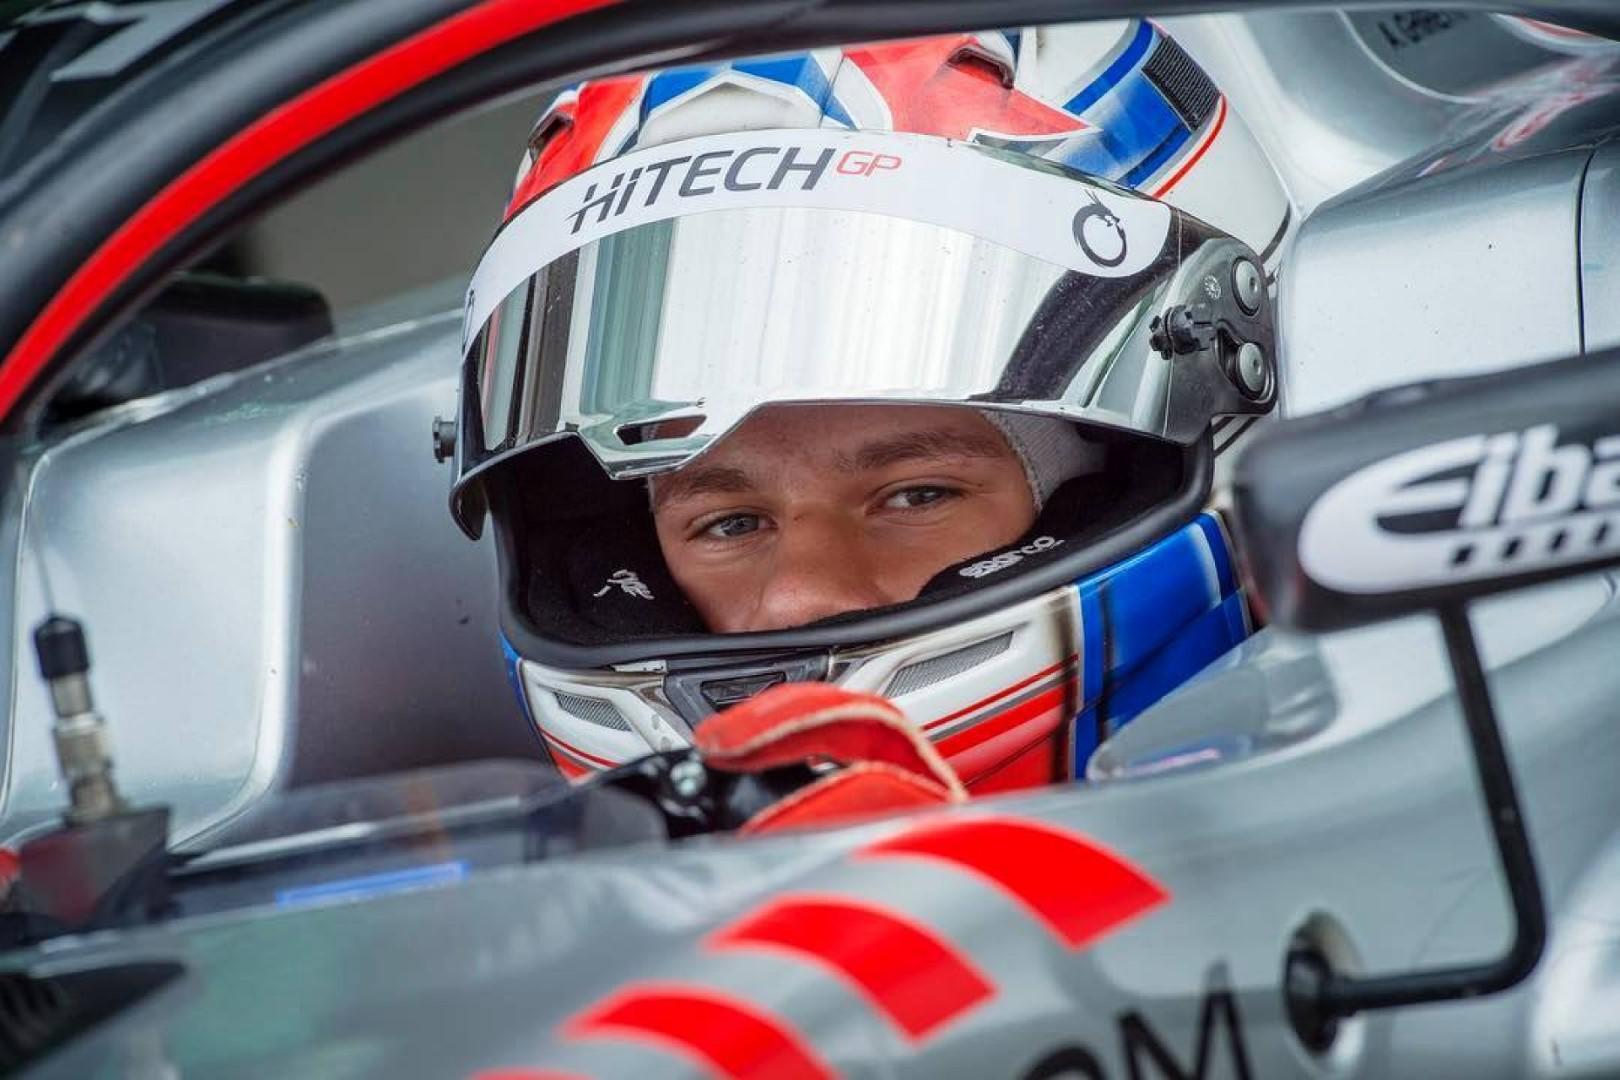 Winter Séries F3 Asian Championship : Alessandro Ghiretti conclu 3ème